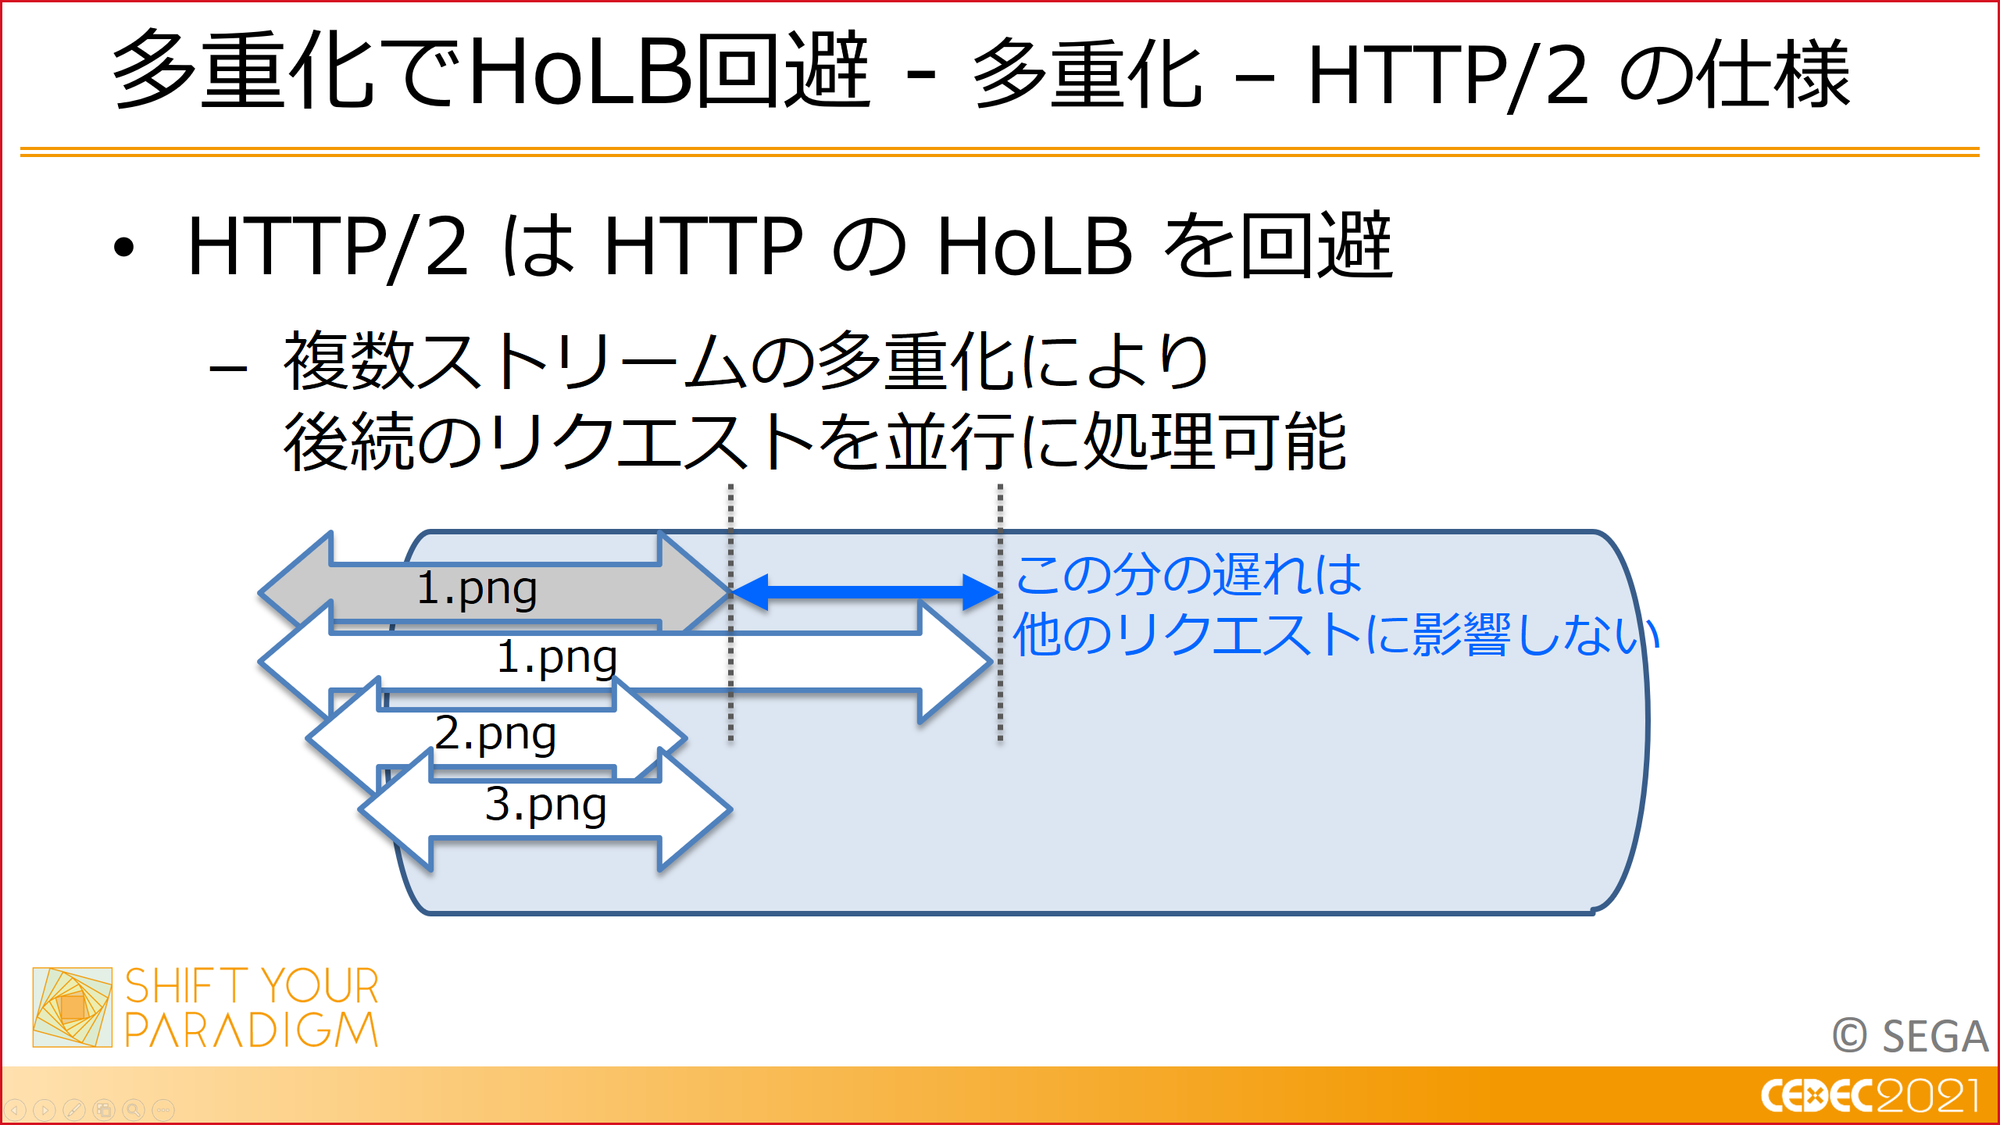 f:id:sgtech:20210720210850p:plain